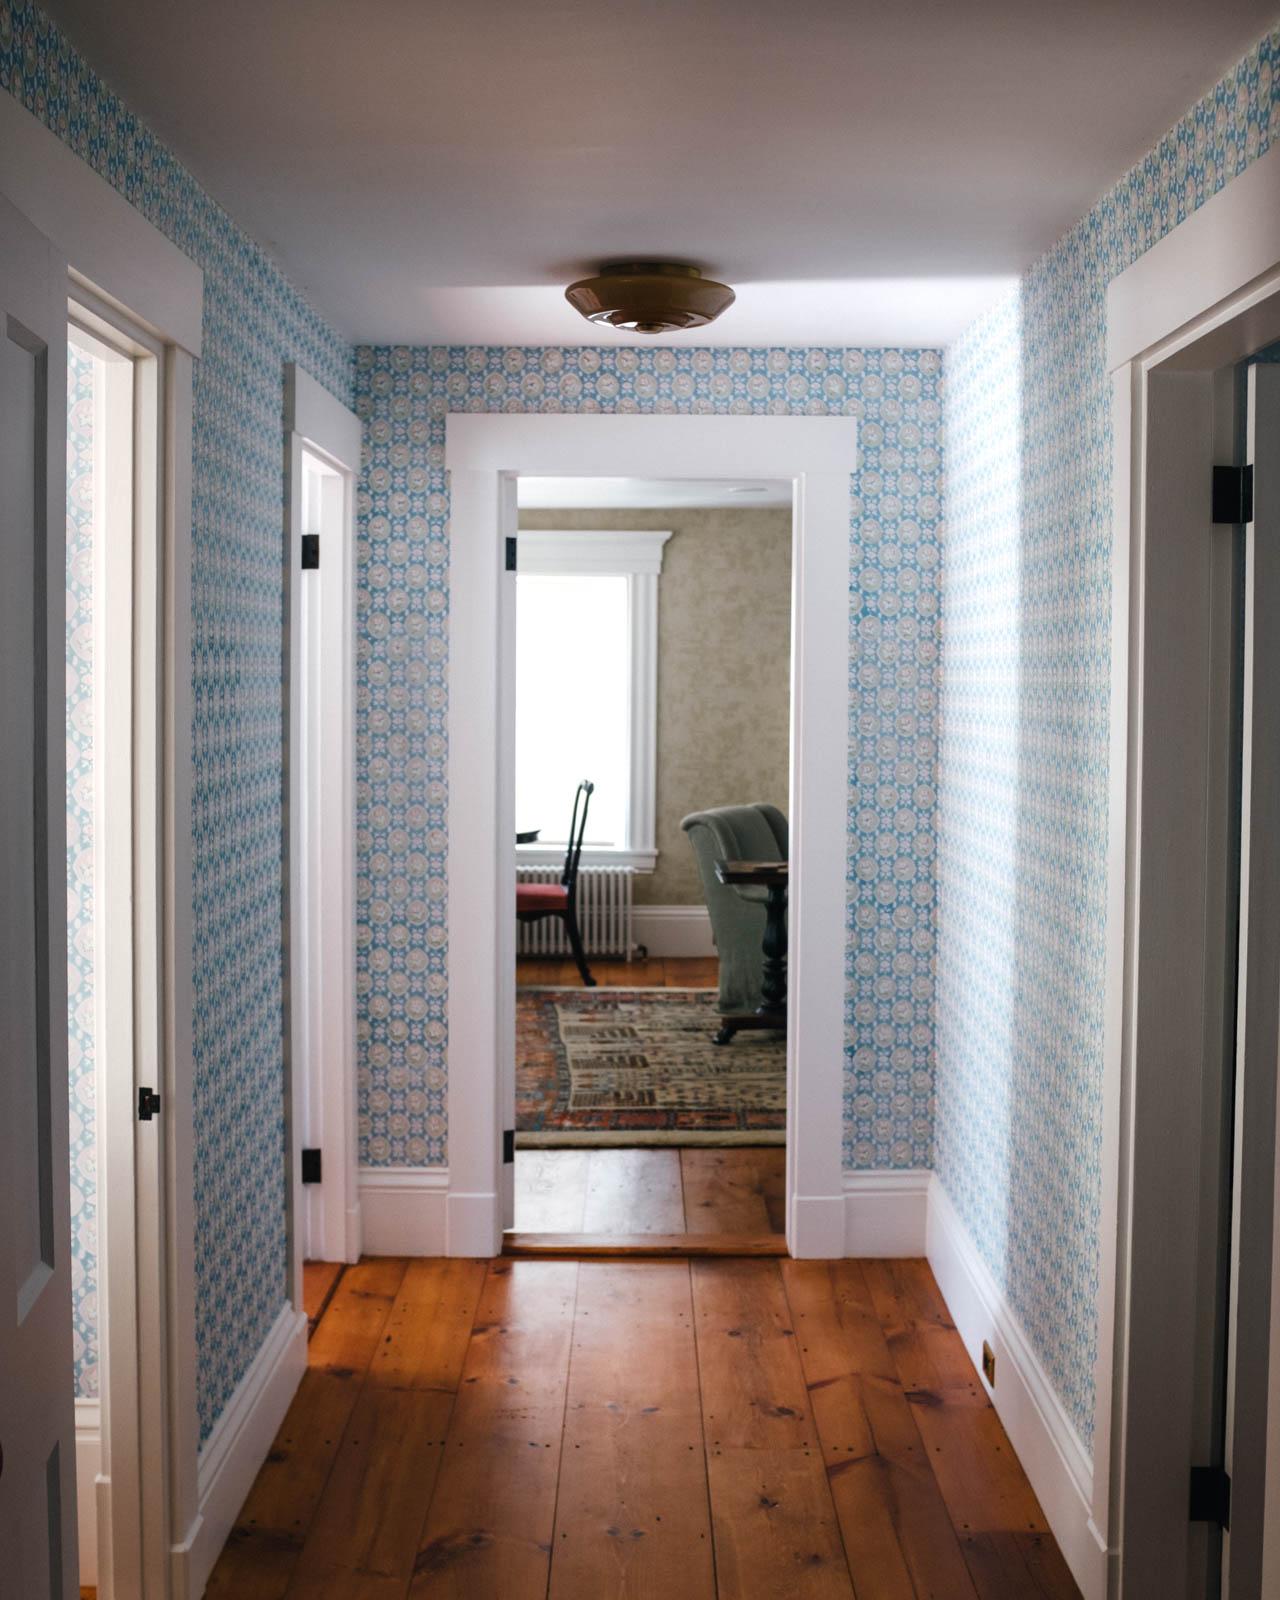 29 Jim_Wallpaper_Interior DS Hall-14DSCF3369-min.jpg